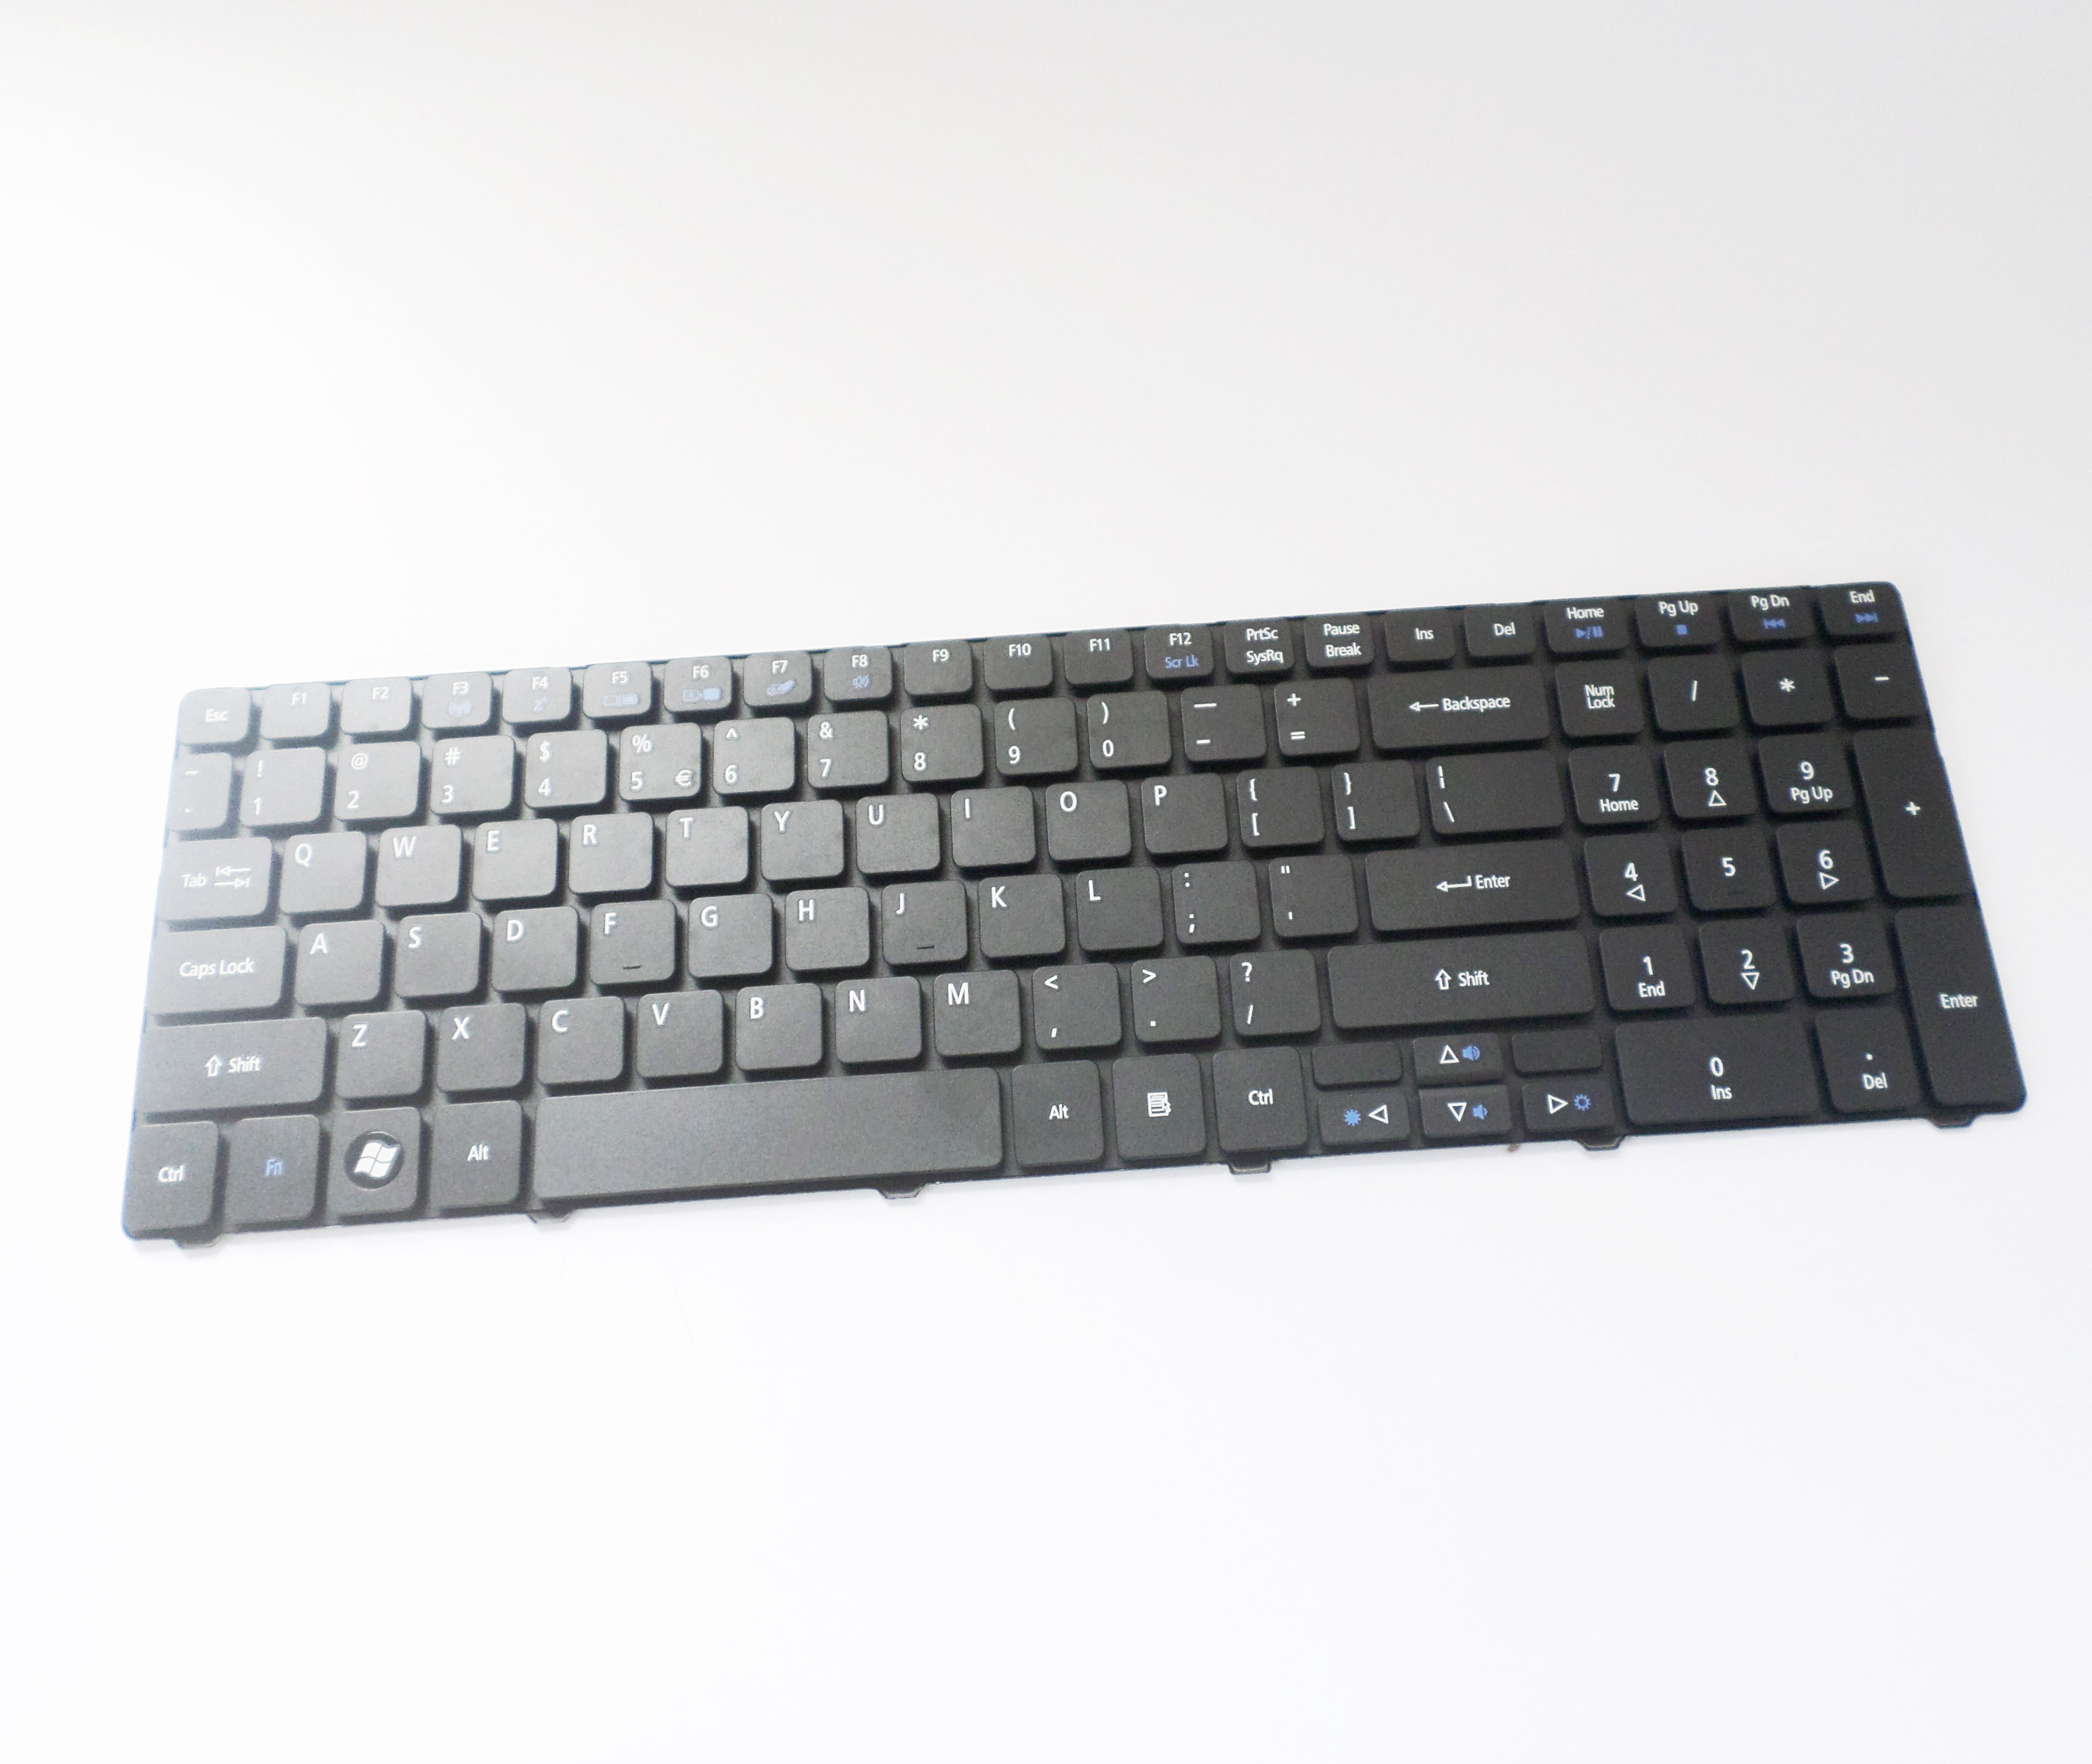 Negro Nuevo diseño nos teclado para Acer Aspire 5536 a 5536G/5739/g/7738/g/7535g 7735/g 7745 7745Z 7745G 7735z-4291 7735 7735Z